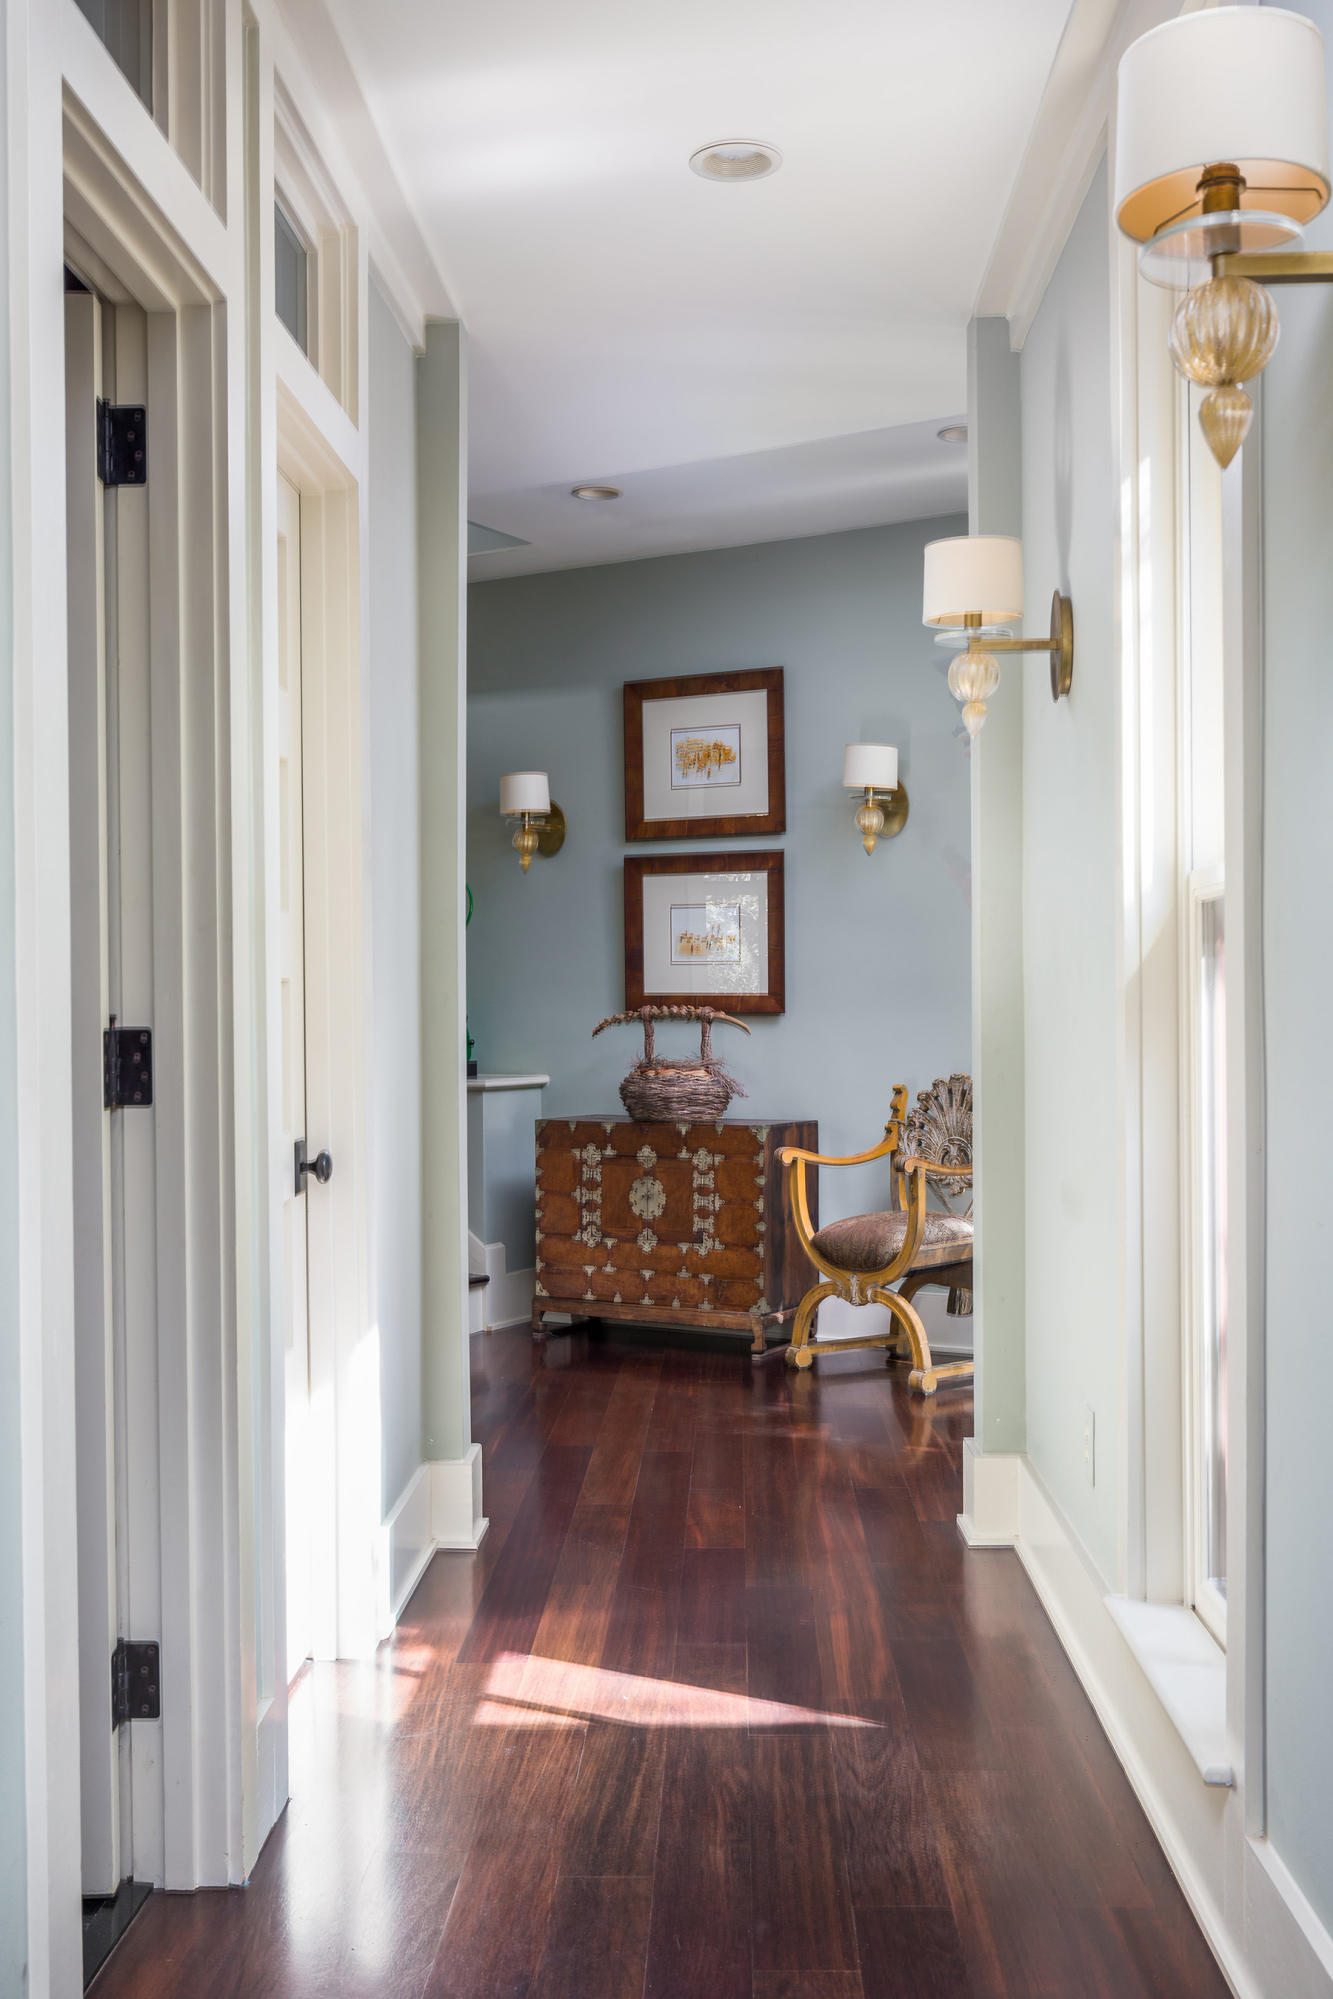 Ellis Oaks Homes For Sale - 672 Ellis Oak, Charleston, SC - 11